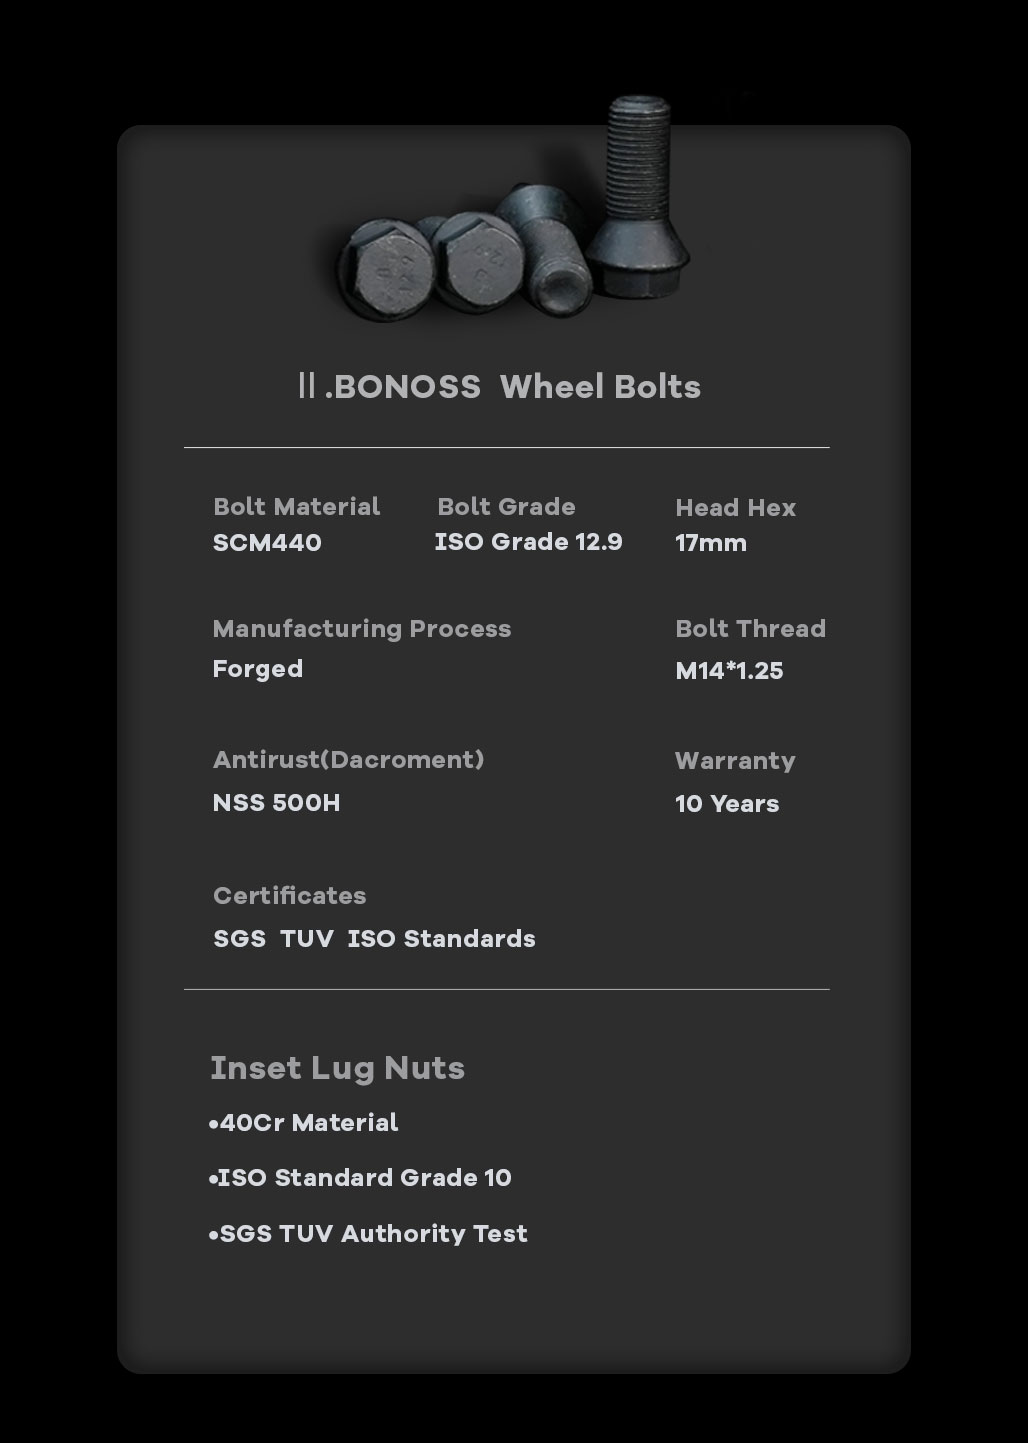 BONOSS-forged-active-cooling-4-Lug-wheel-spacers-(custom-wheel-spacers)-M14x1.25-by-lulu-10